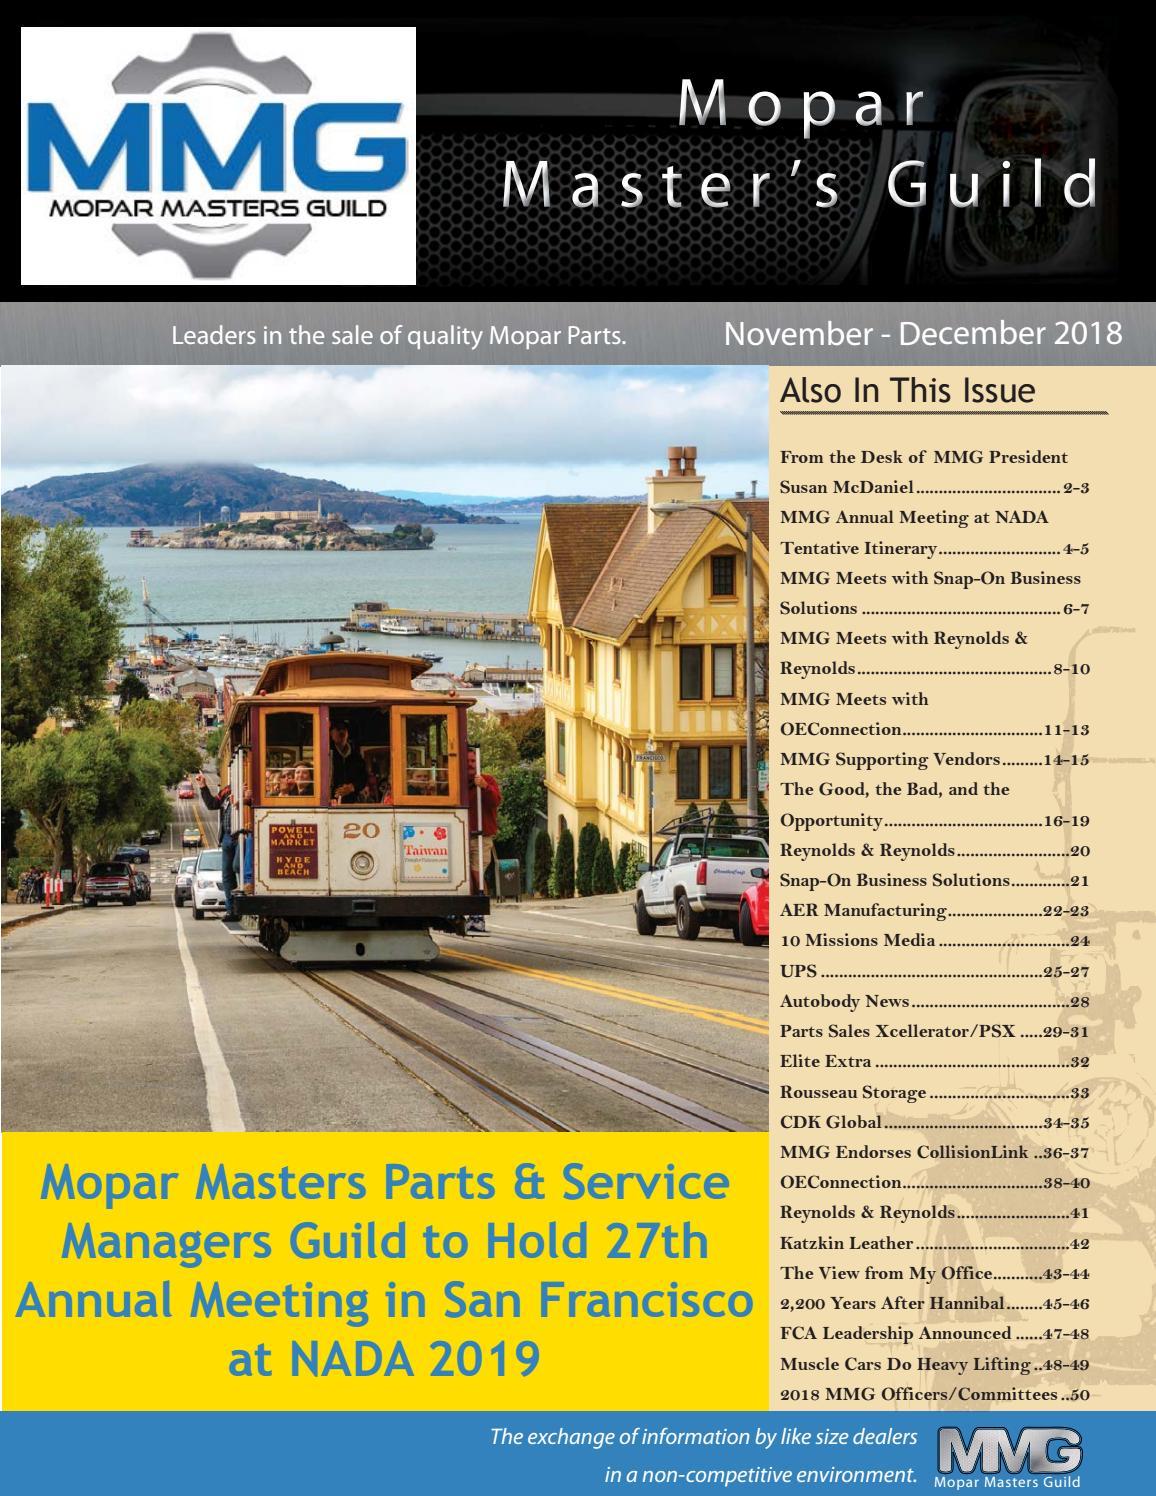 Mopar Masters Guild Magazine November - December 2018